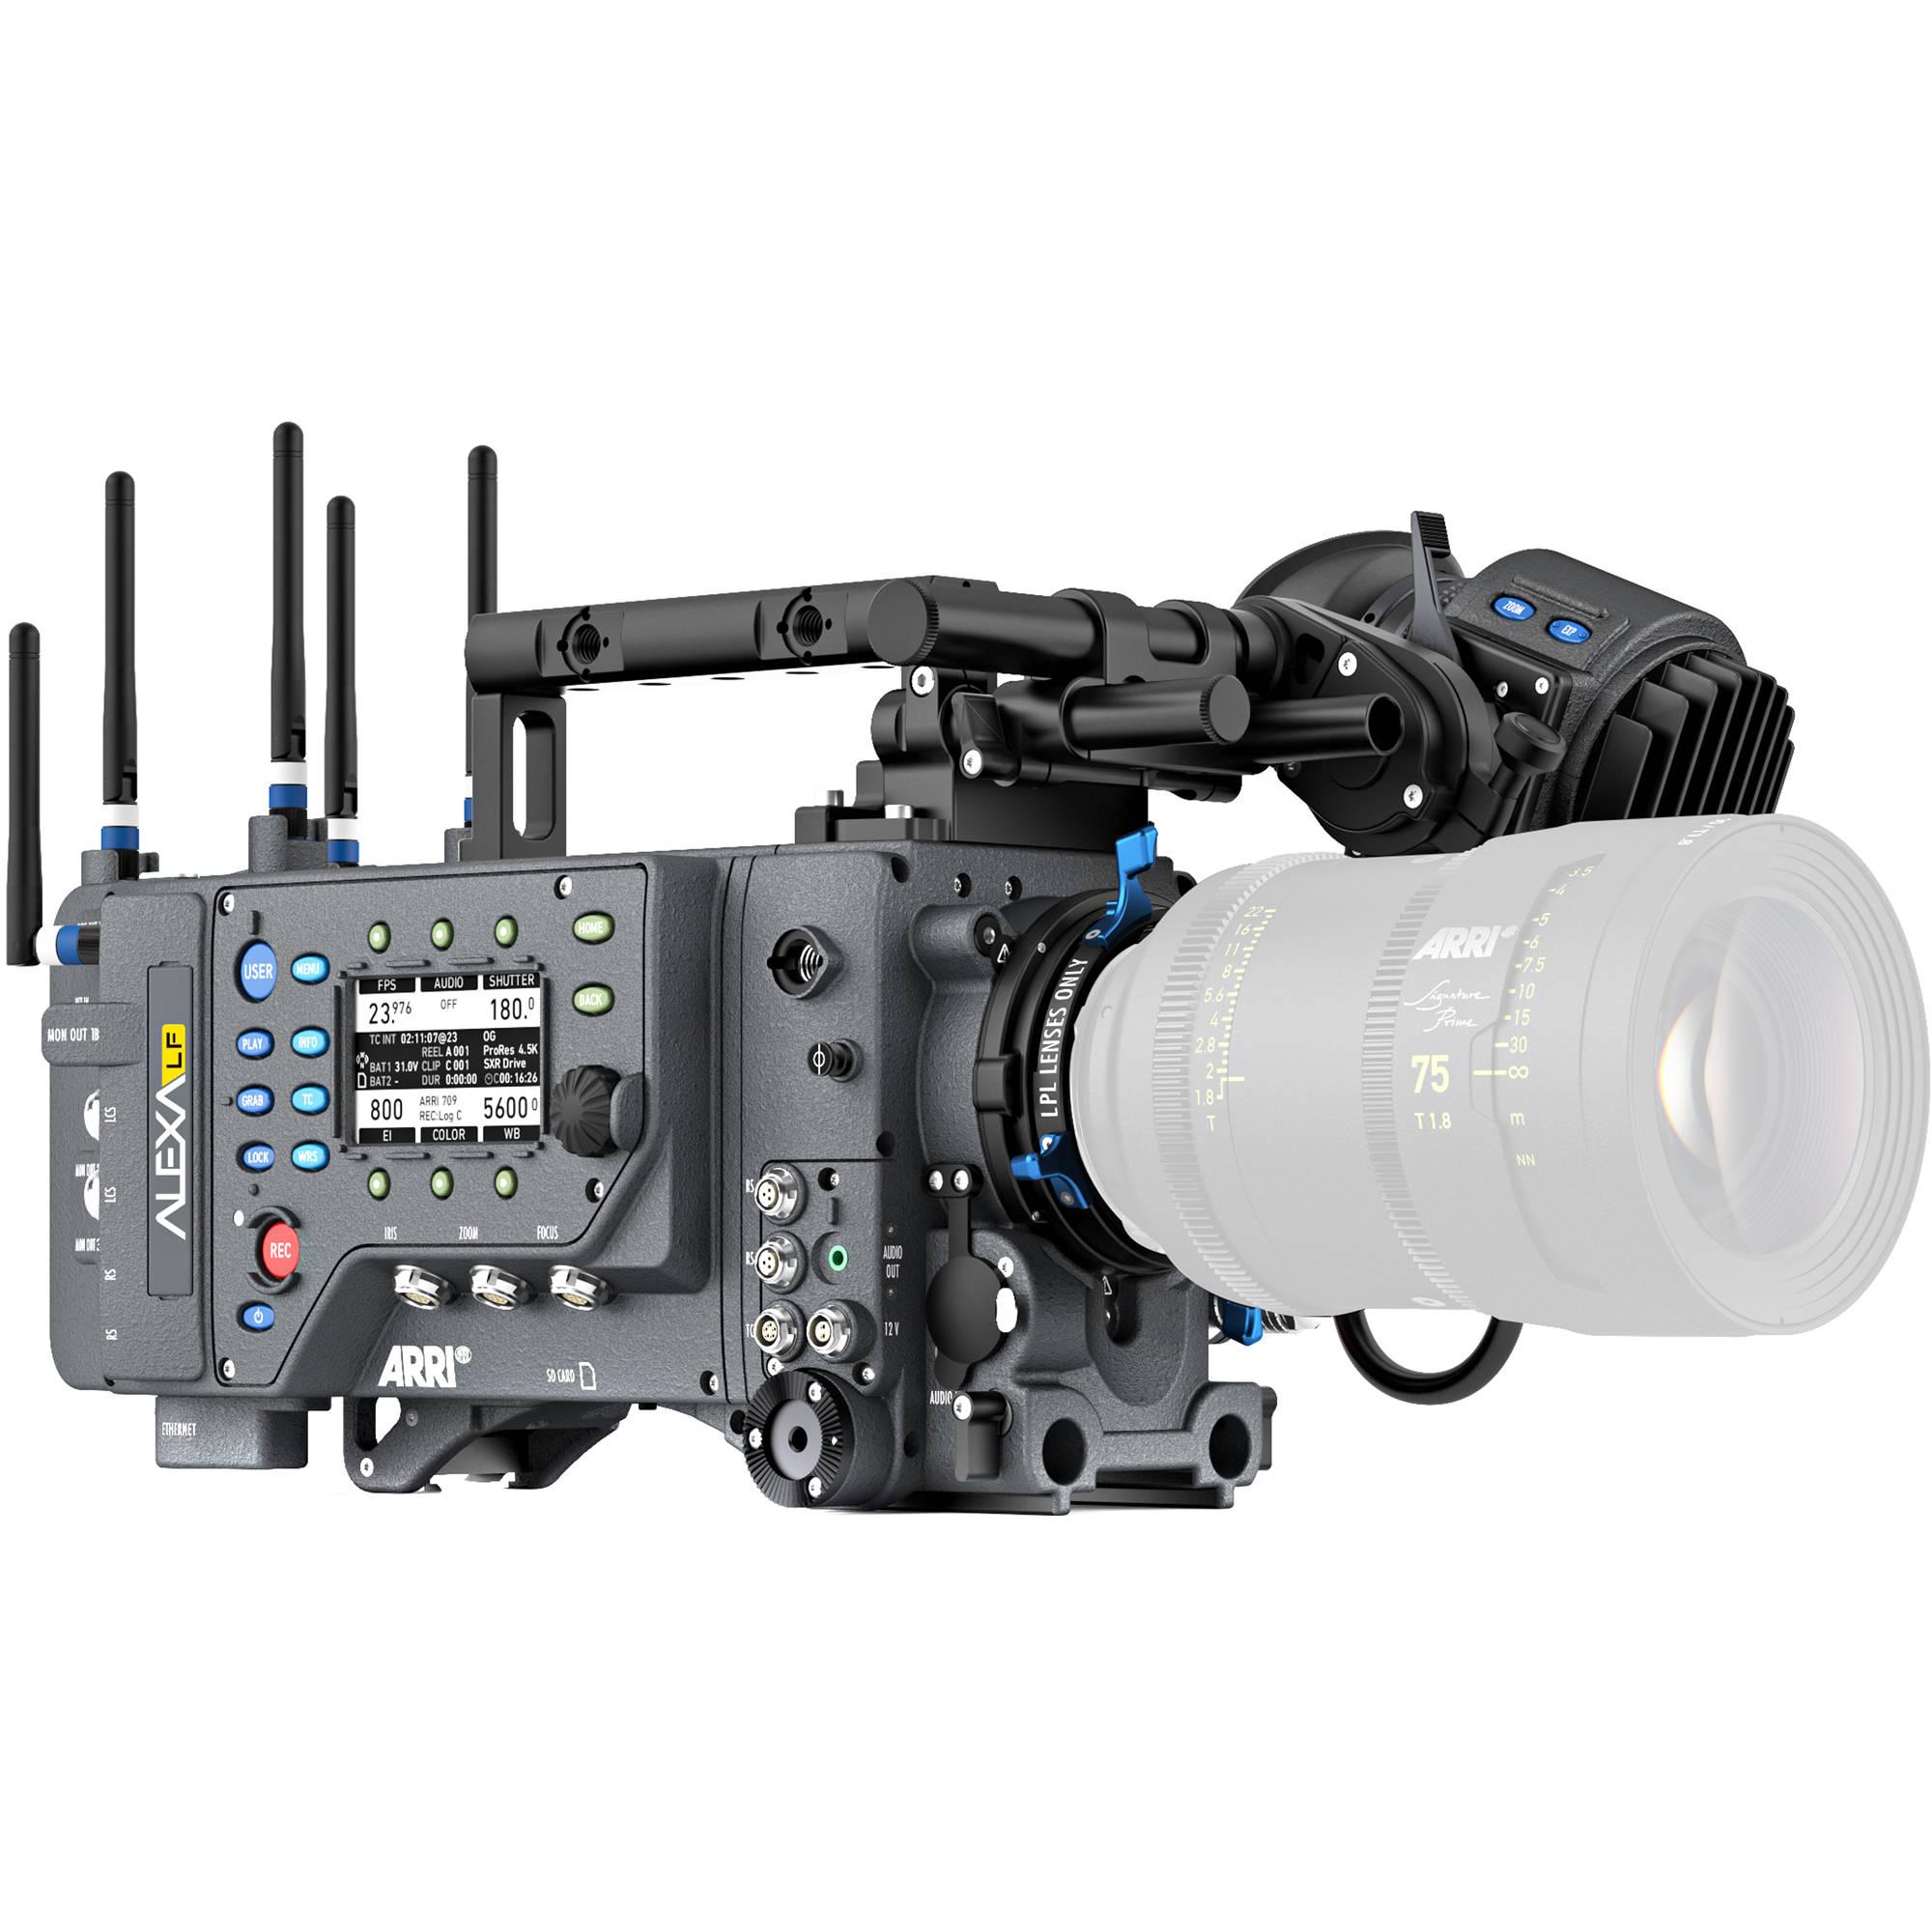 Https C Product 1388939 Reg Round Pin Tractor Trailer Circuit Tester Amazoncouk Diy Tools Arri Kb 72010 D Alexa Lf Pro Camera 1389653